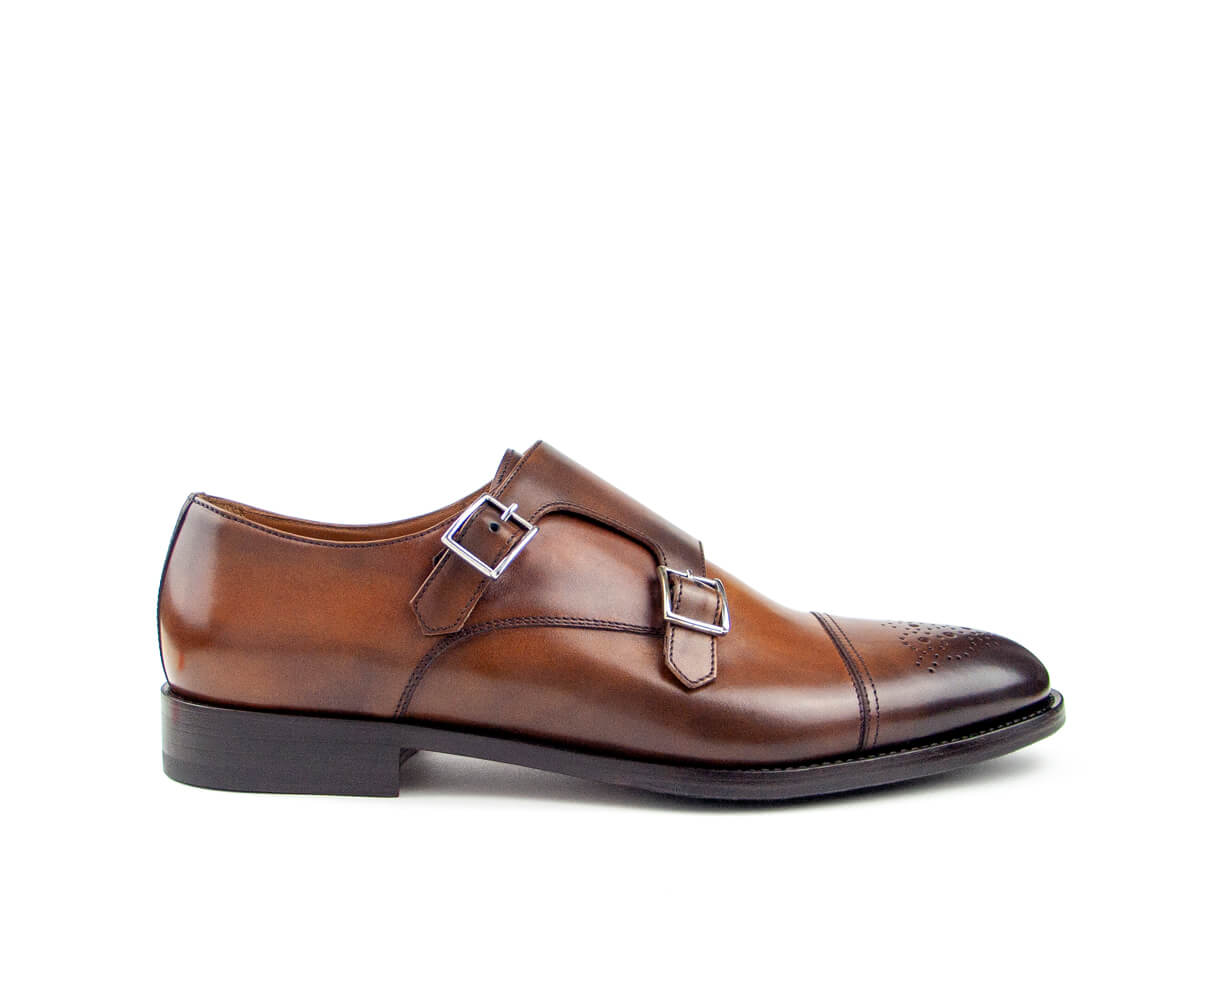 015 ecla scarpe rgb